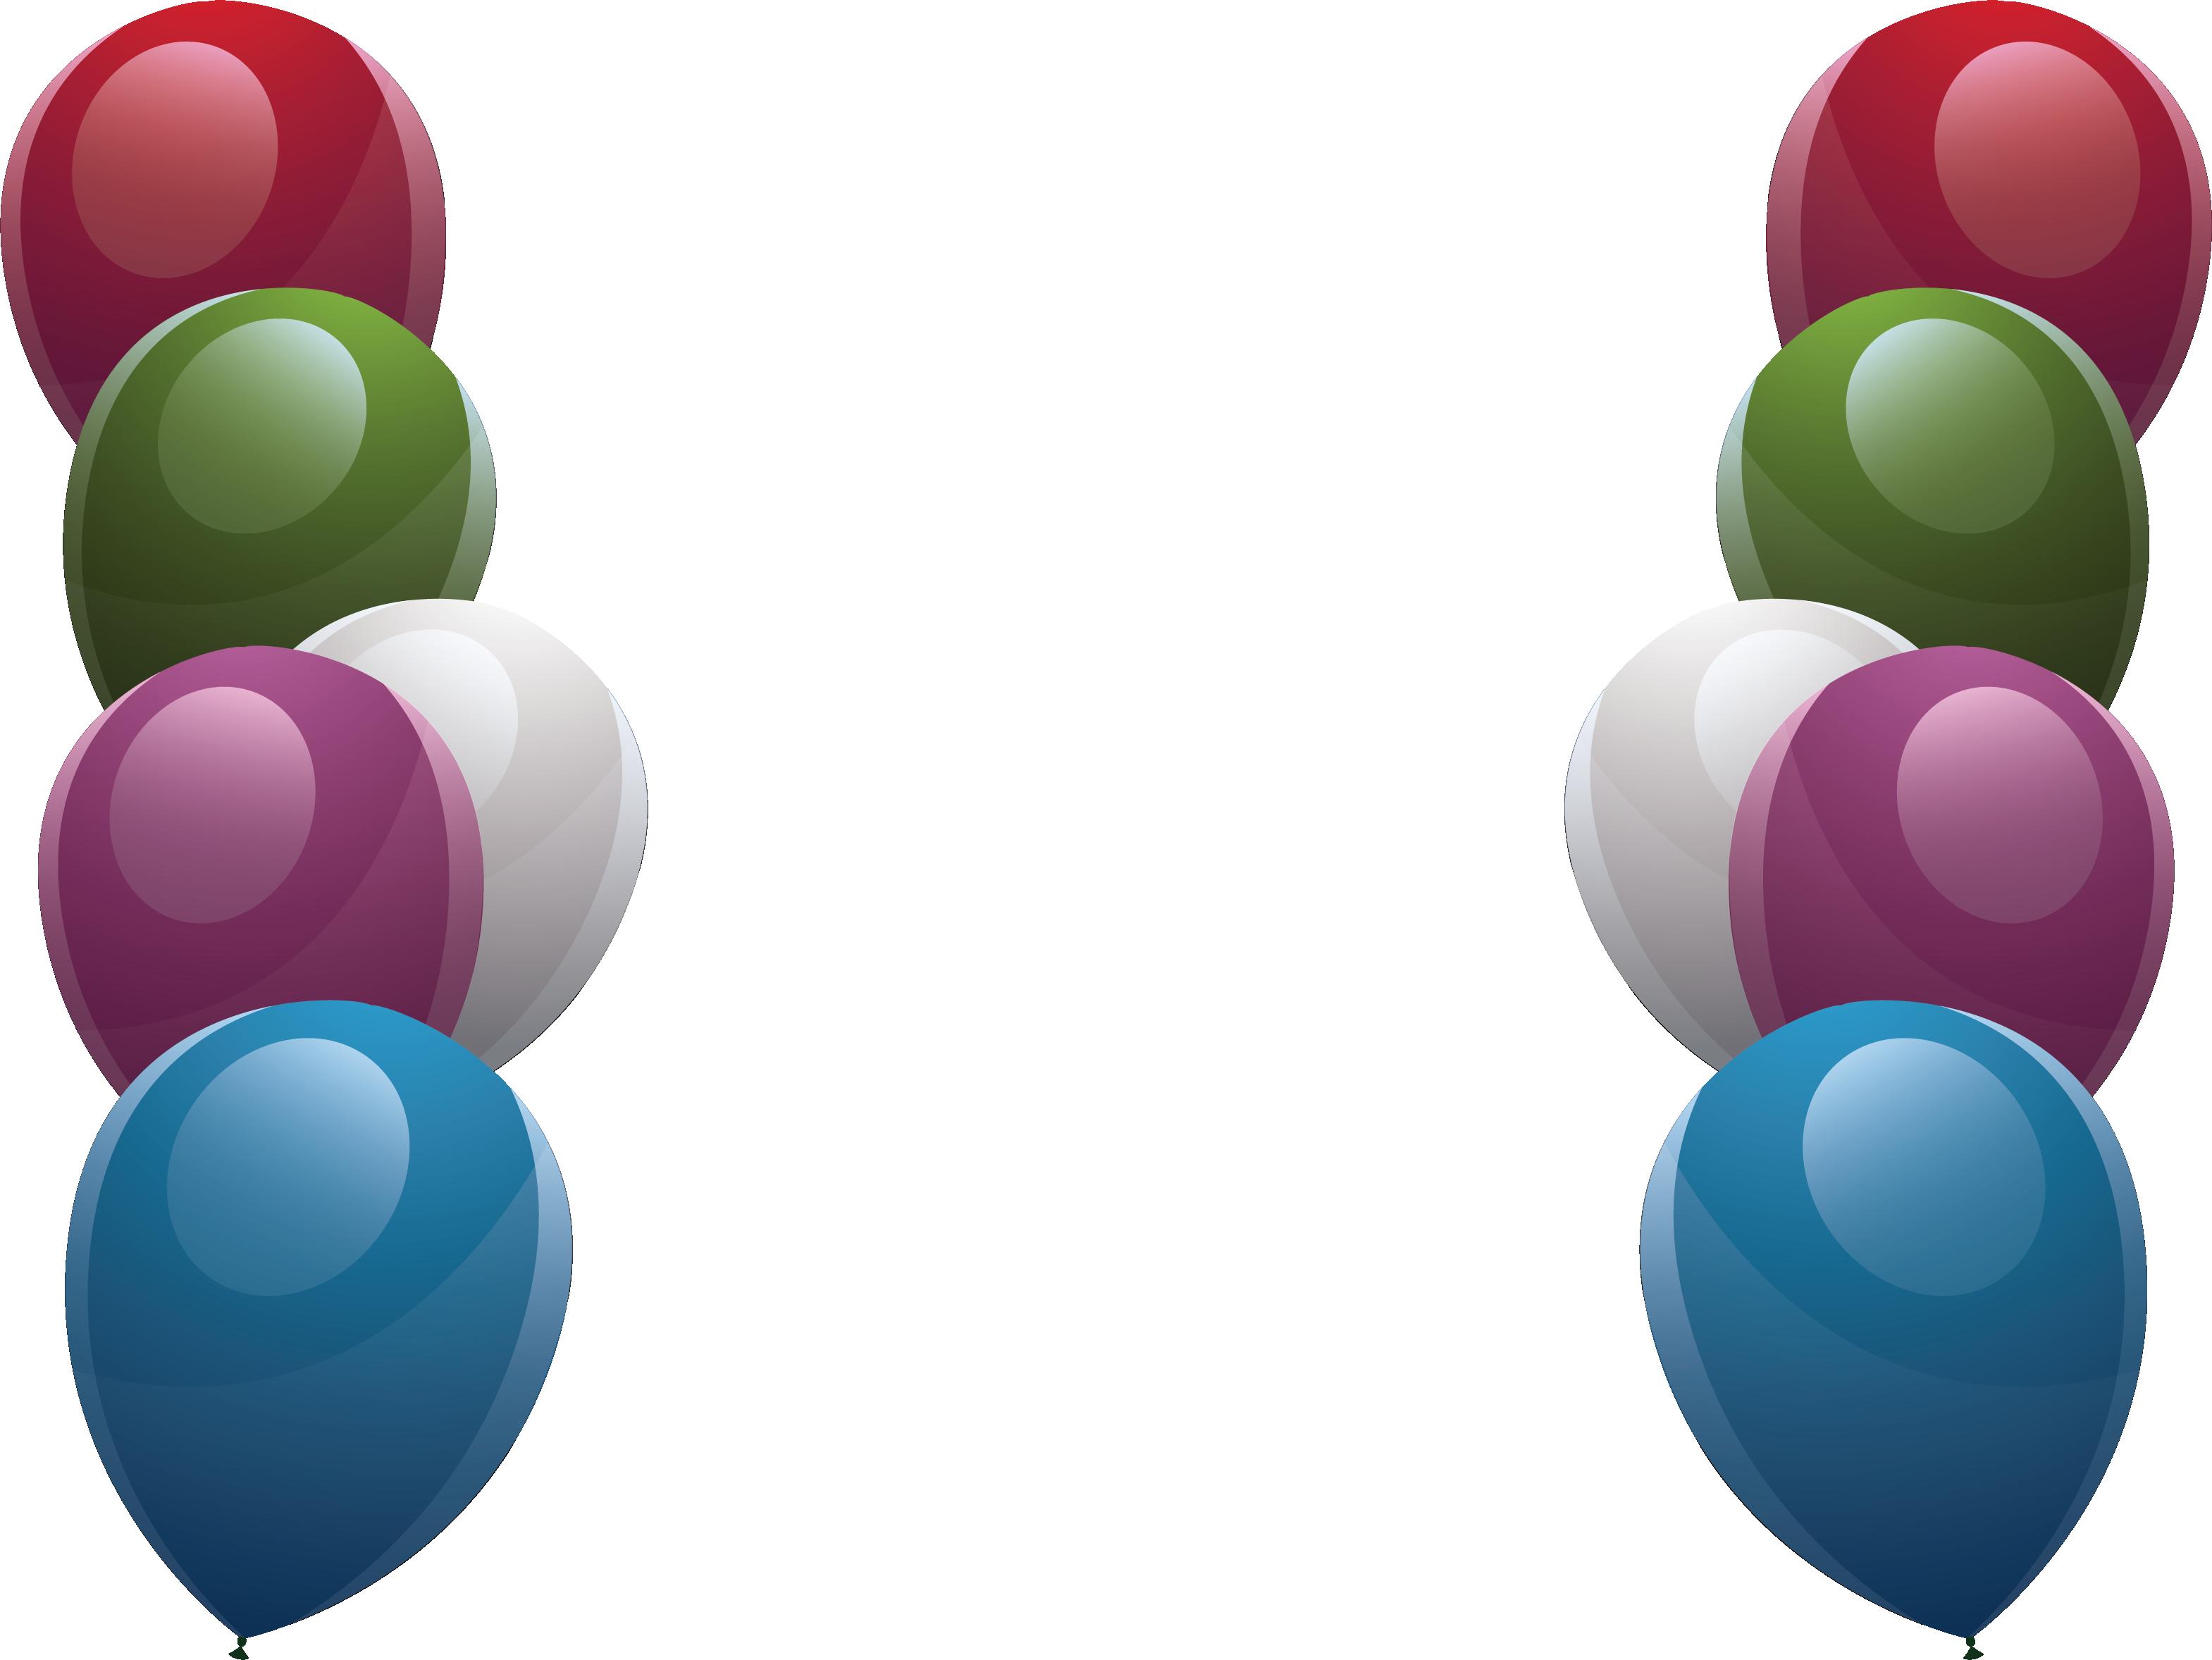 vector royalty free stock Designer fine color transprent. Balloon borders clipart.